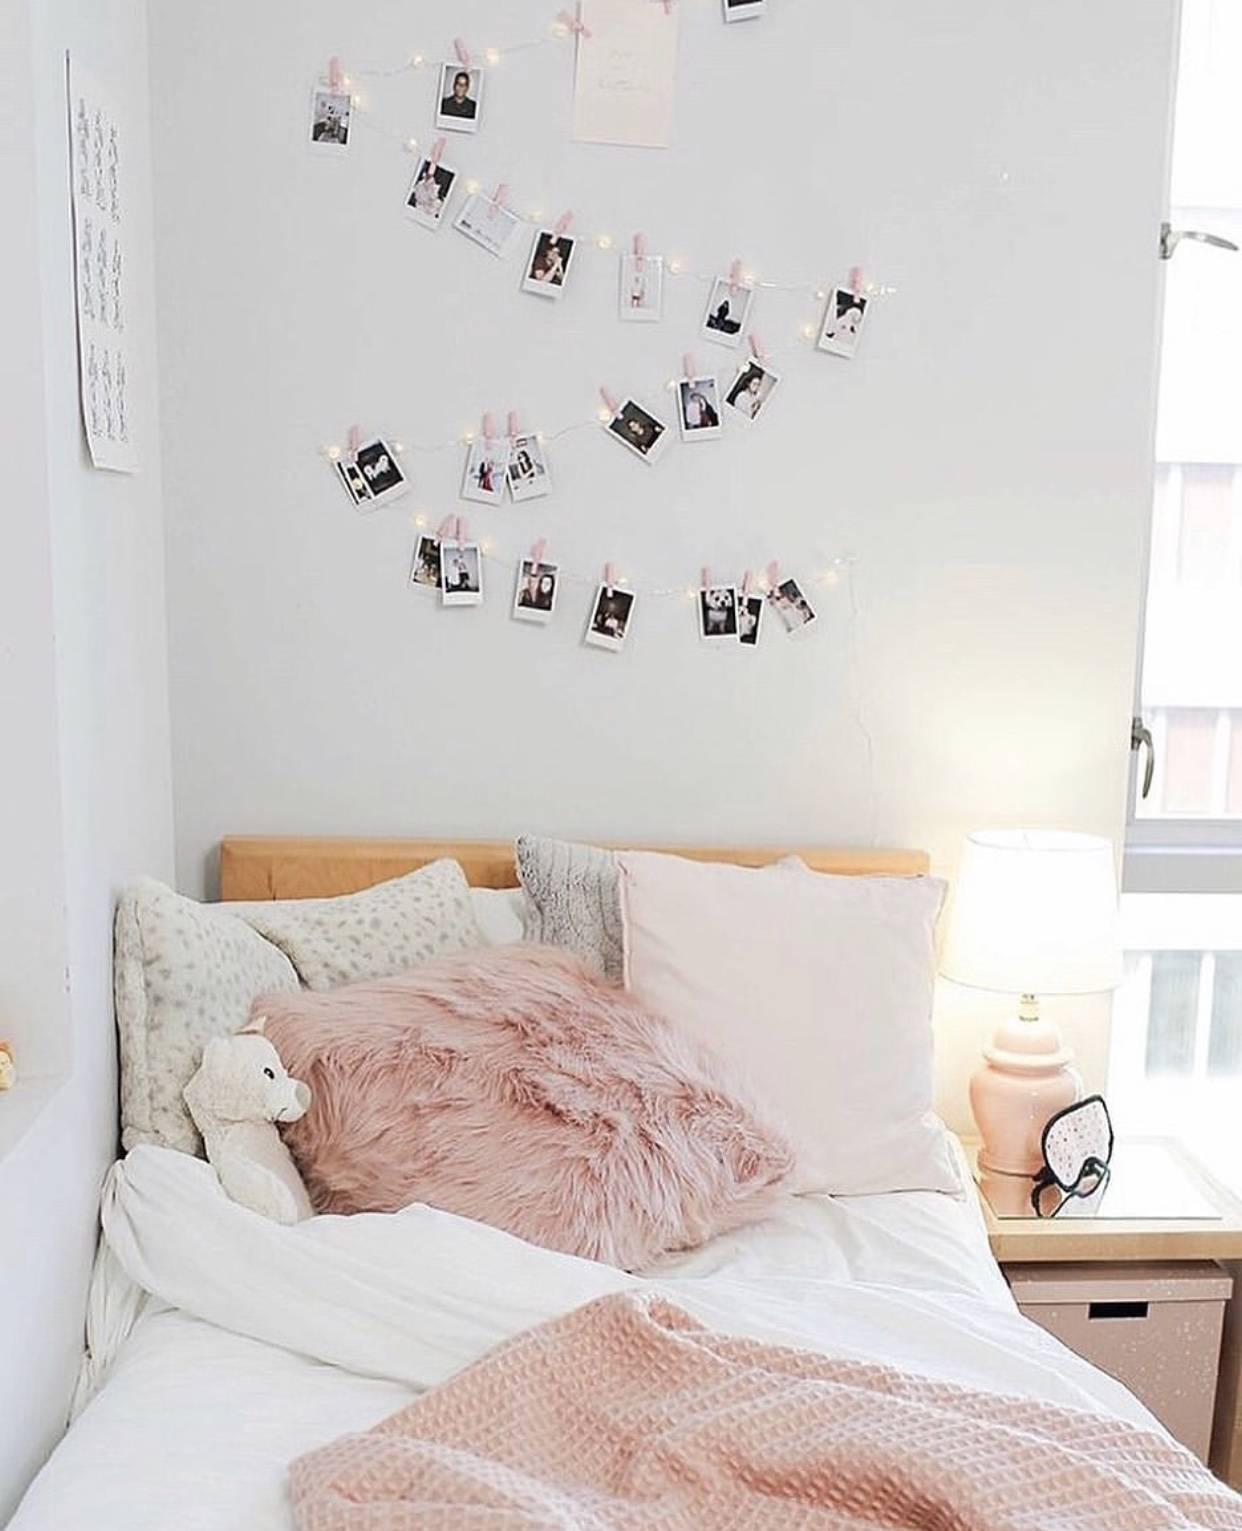 Vsco Room Ideas How To Create A Cute Vsco Room The Pink Dream